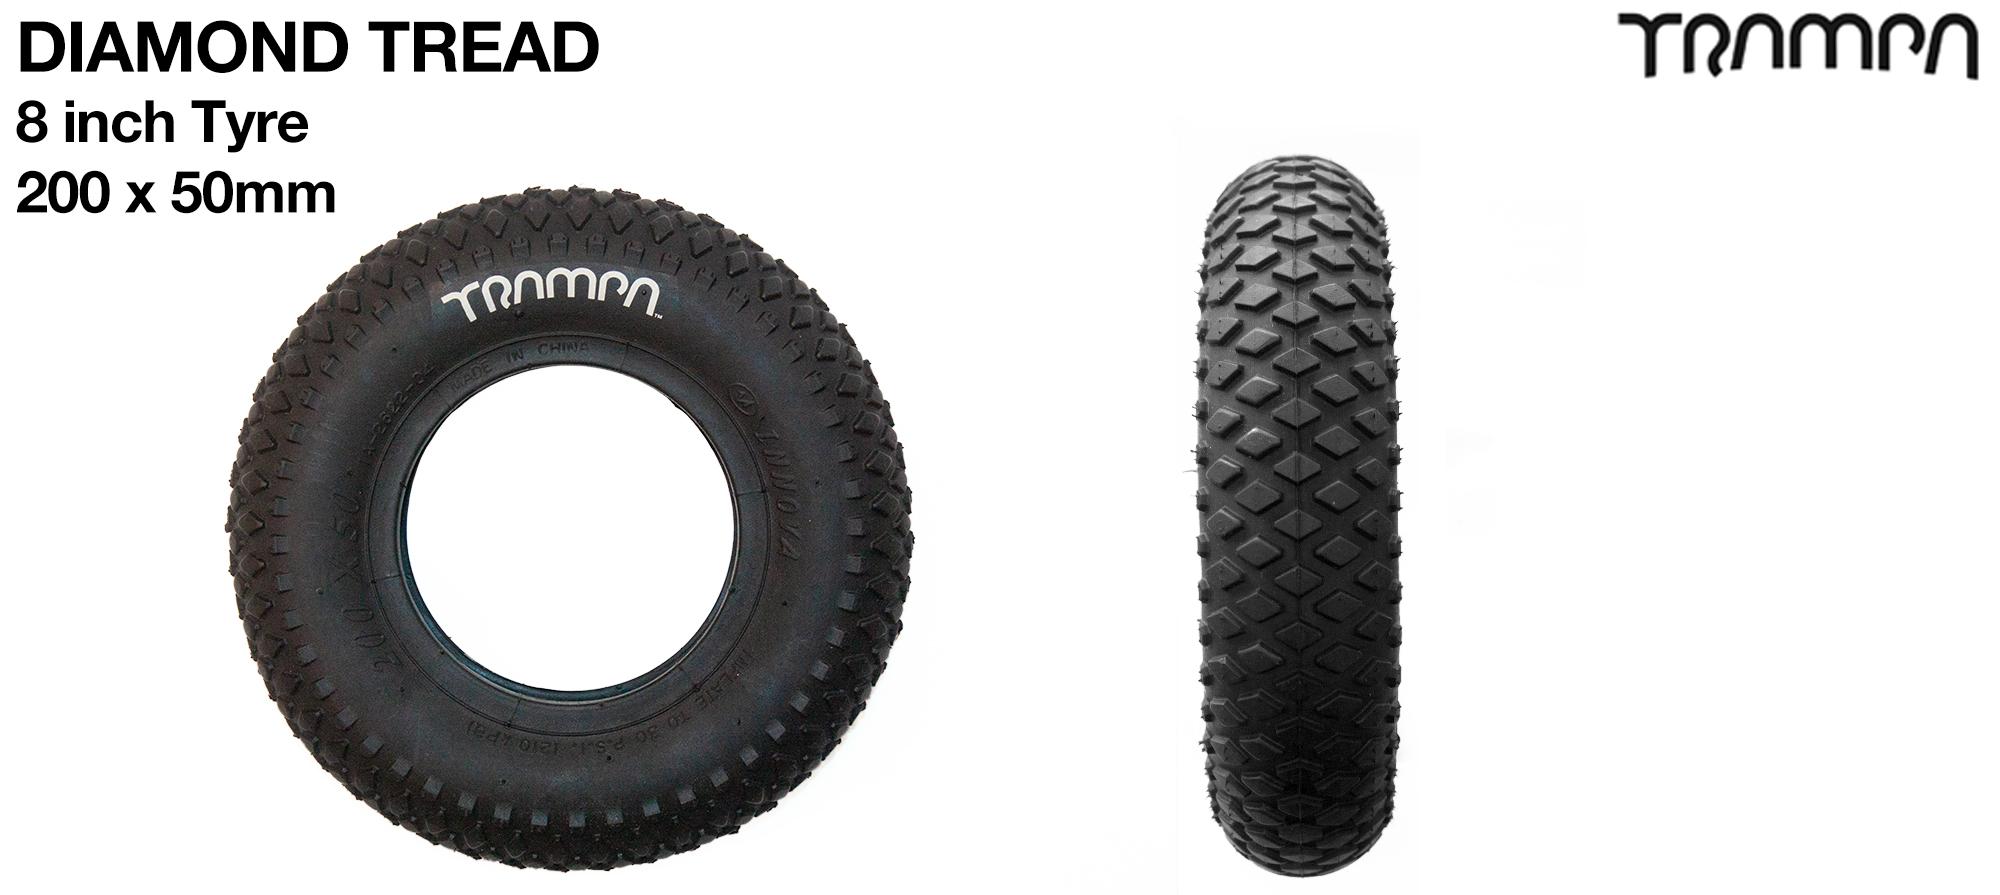 8 Inch DIAMOND TREAD Tyre